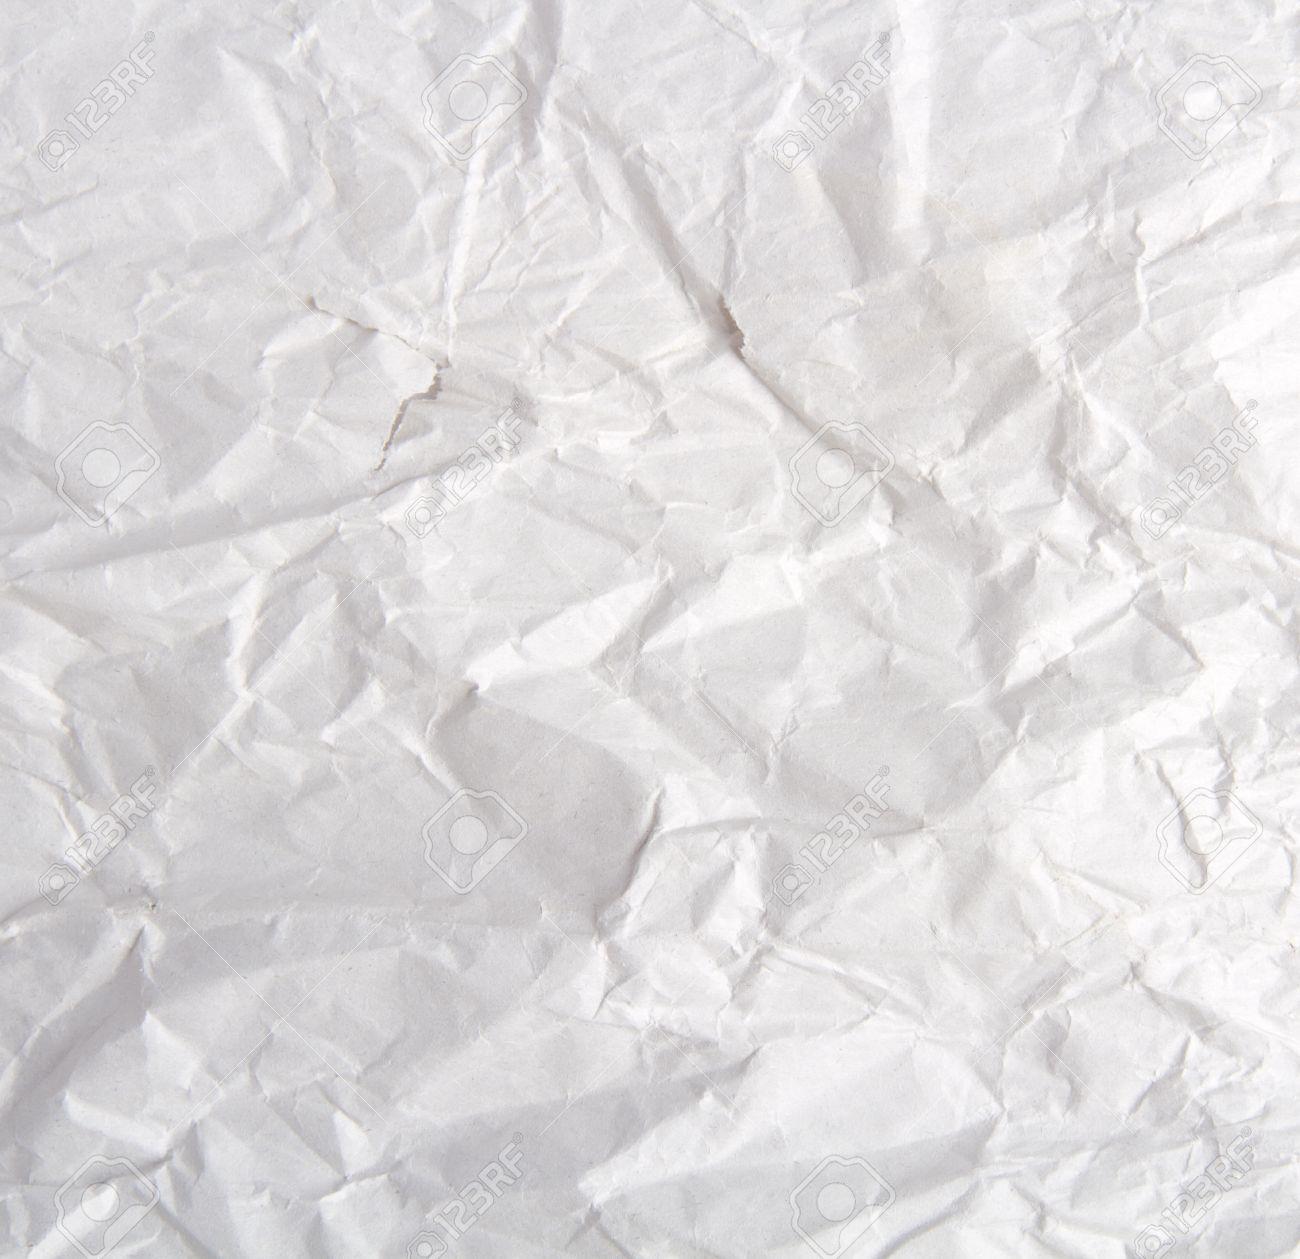 wrinkled paper texture royalty free fotografie a reklamní fotografie